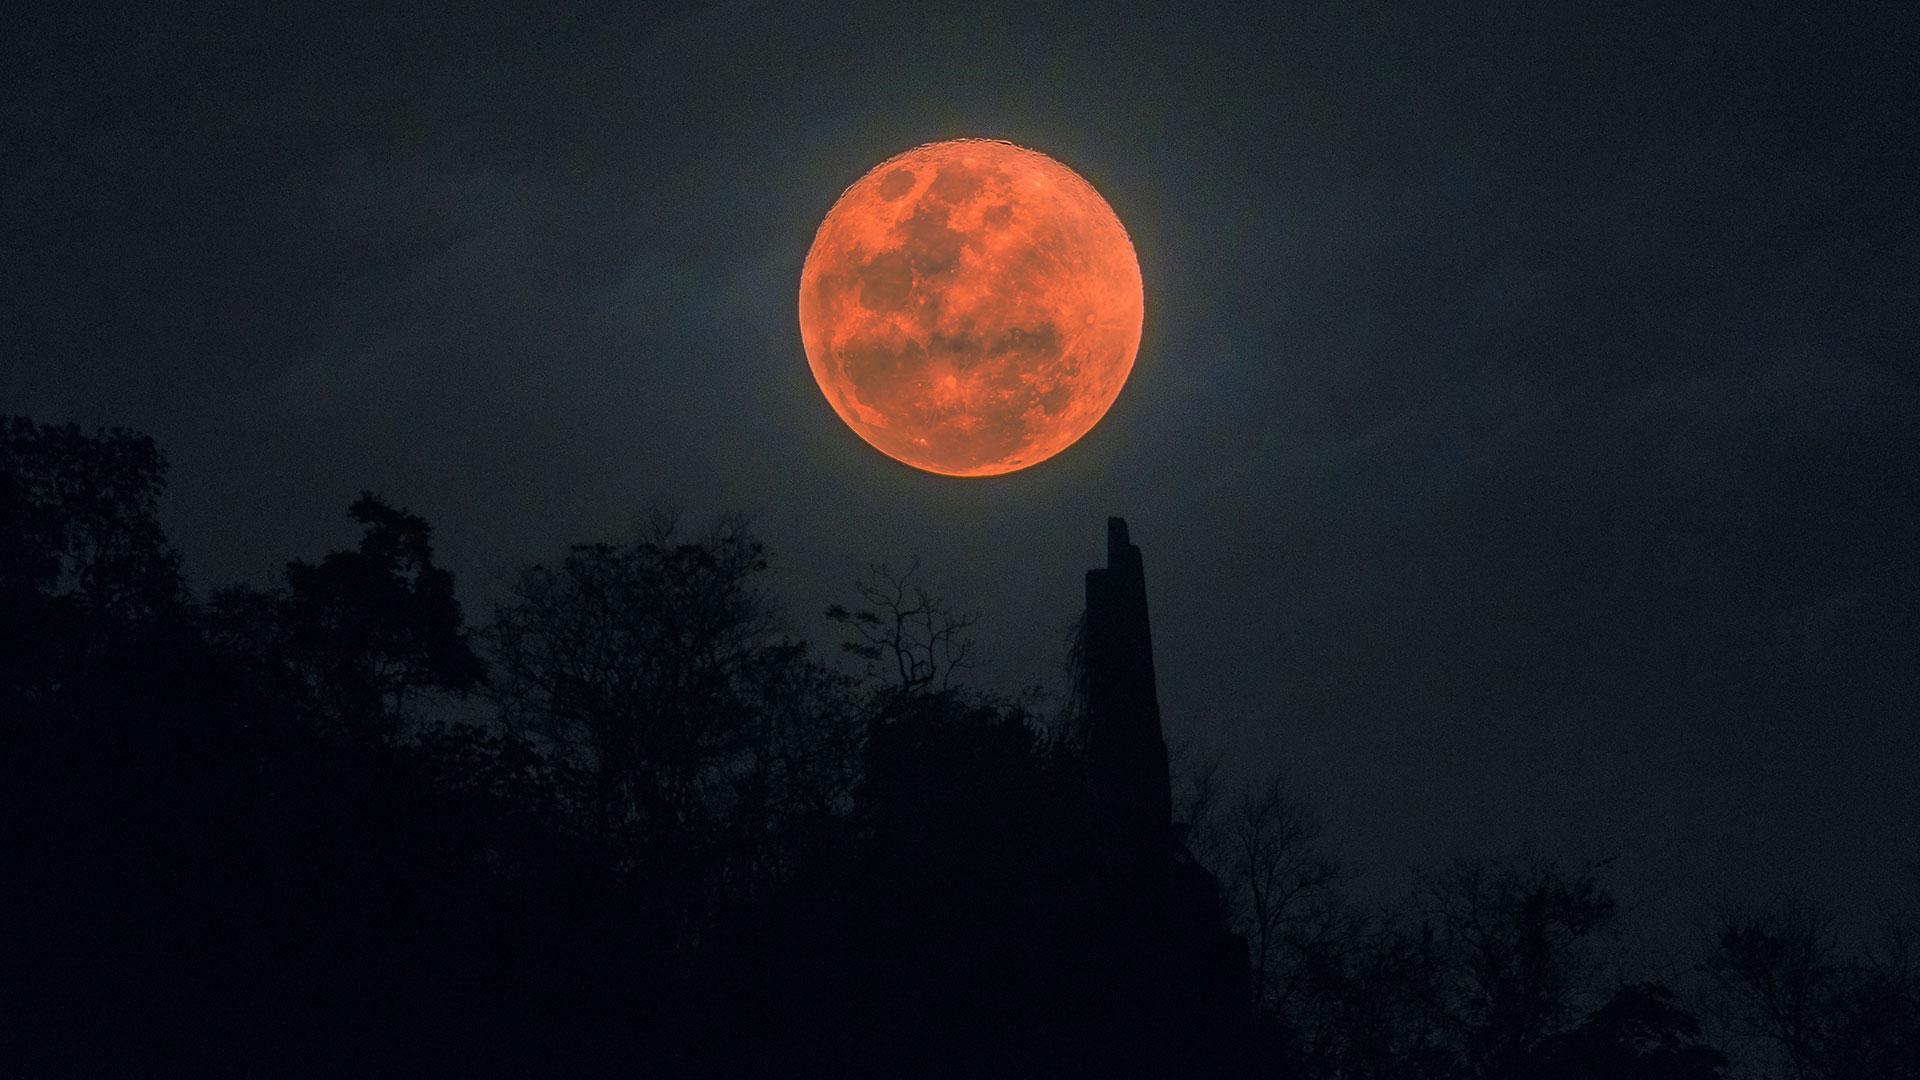 blood moon january 2019 est time - photo #23